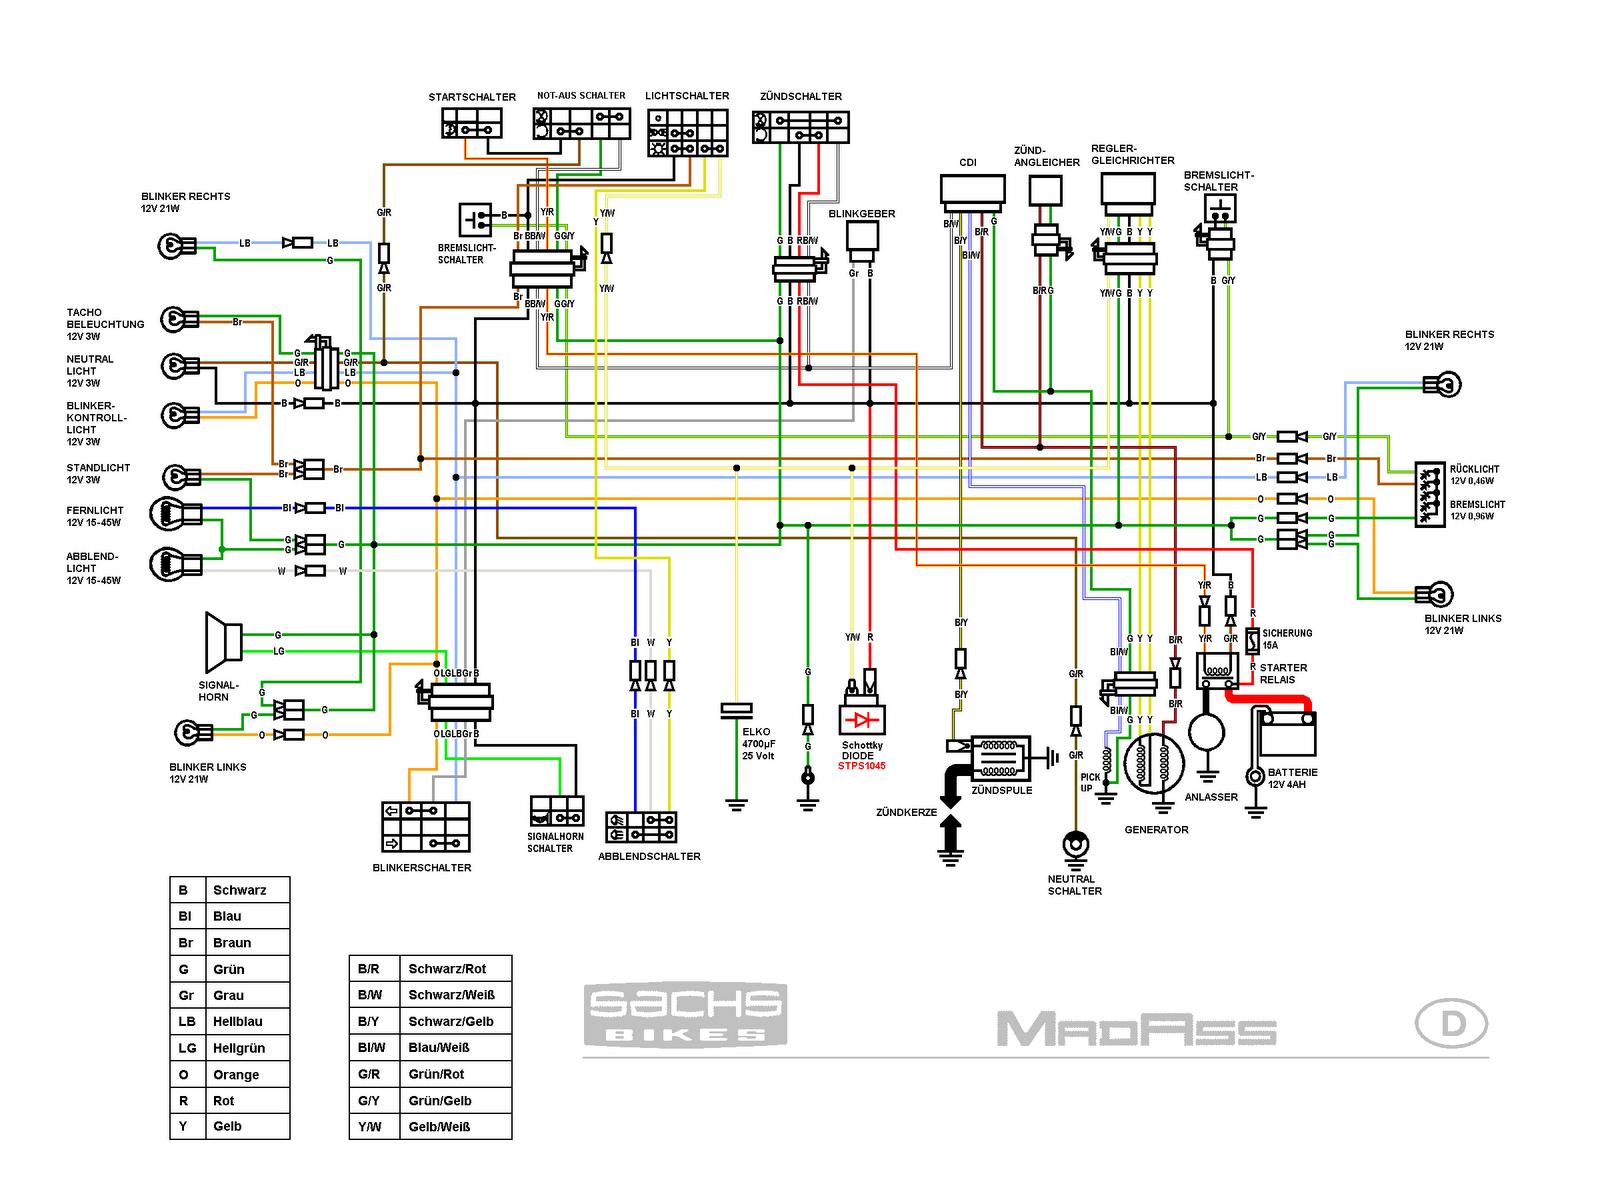 Wiring Diagram For Gsxr 600 - on